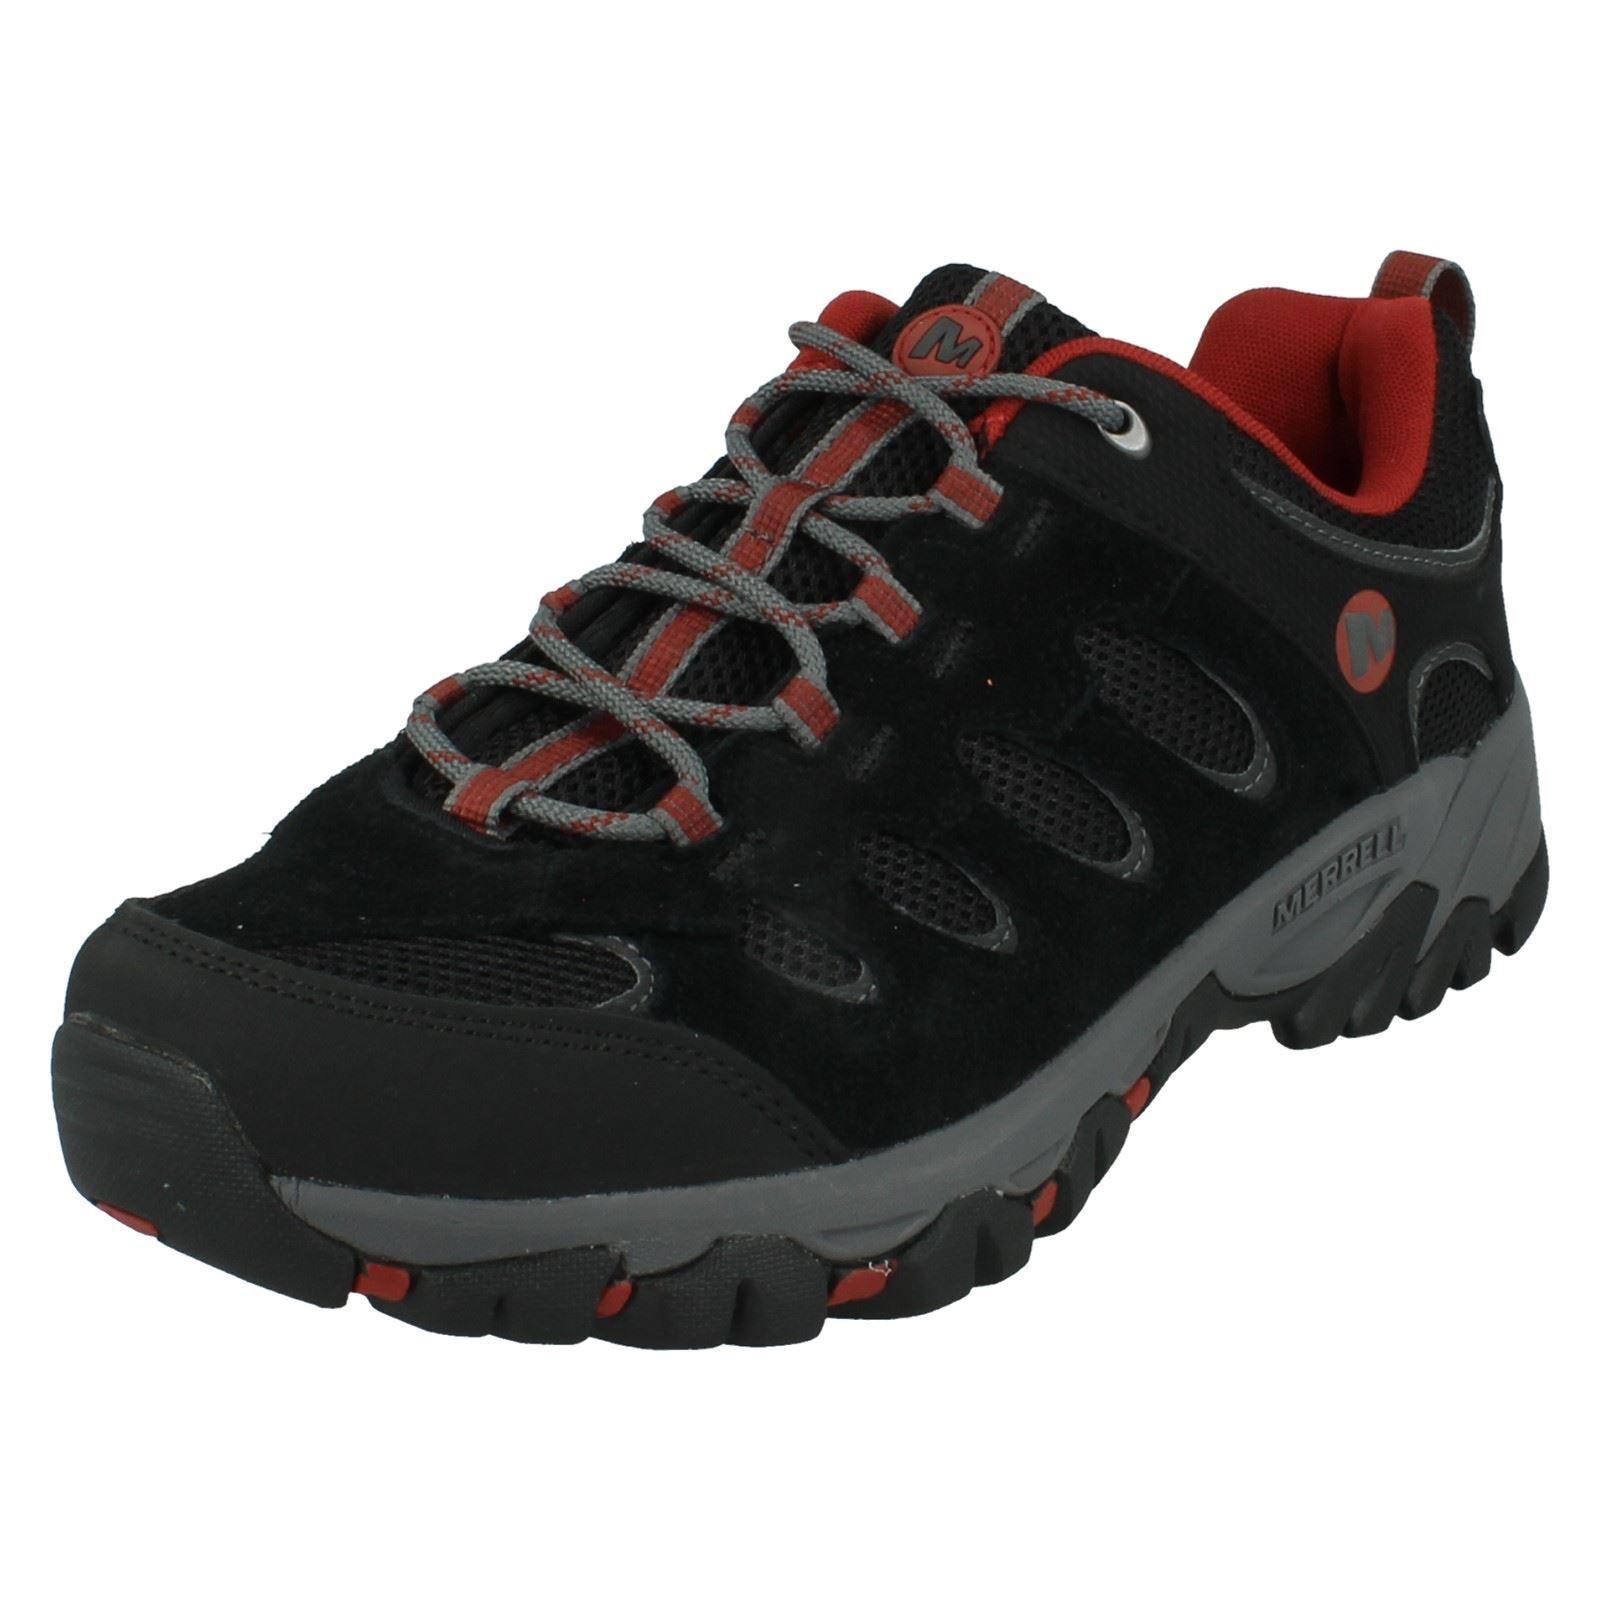 Zapatillas para hombre ridgepass Negro Rojo por Merrell-Precio